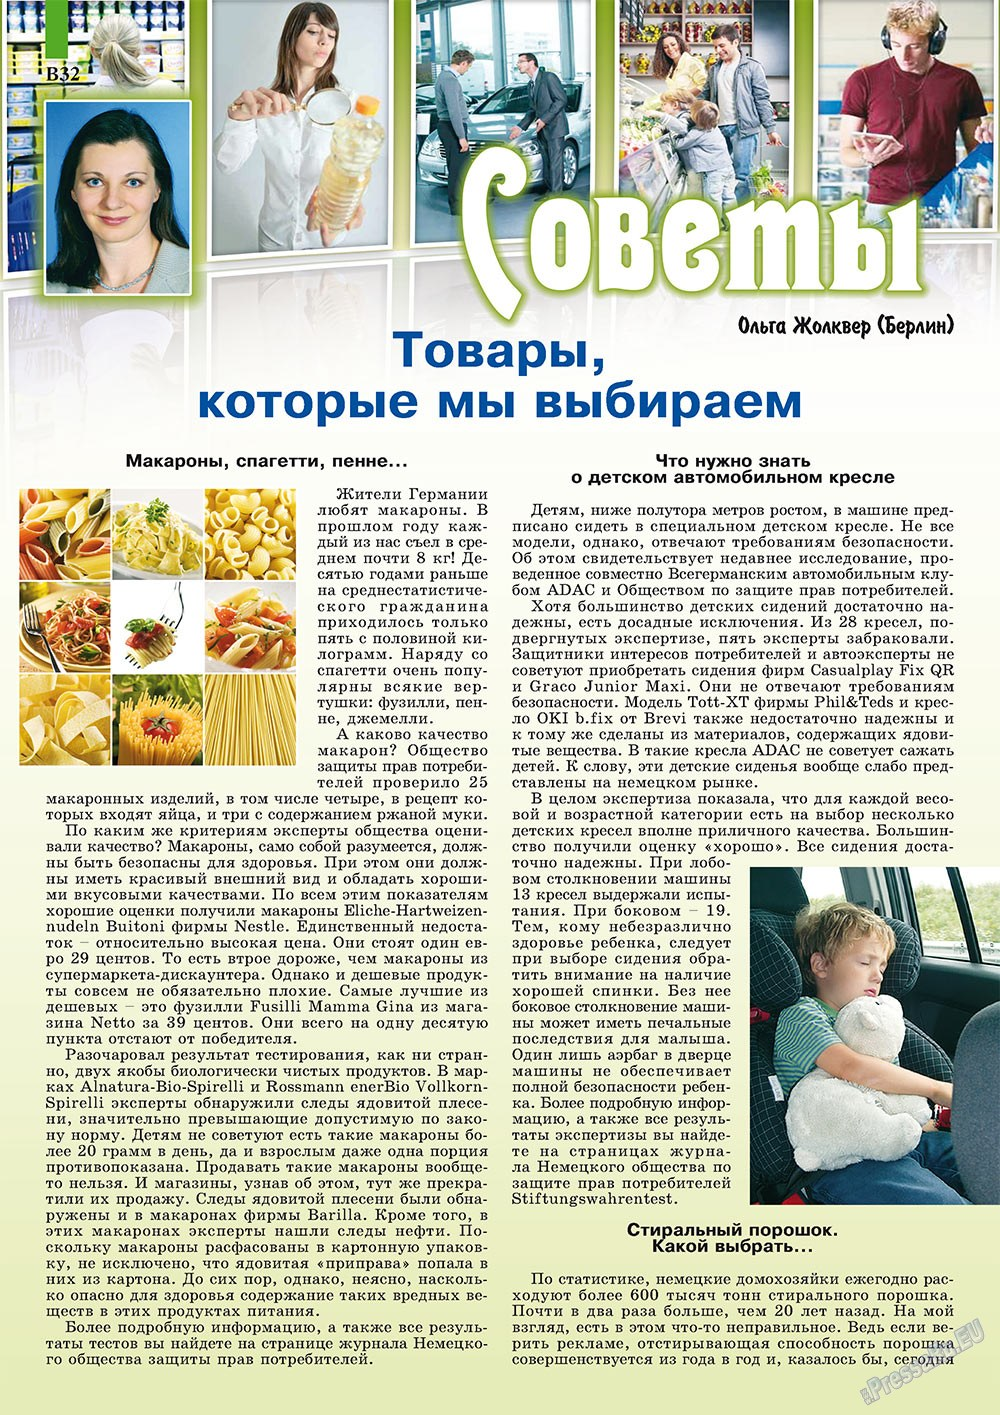 Партнер-север (журнал). 2011 год, номер 7, стр. 42